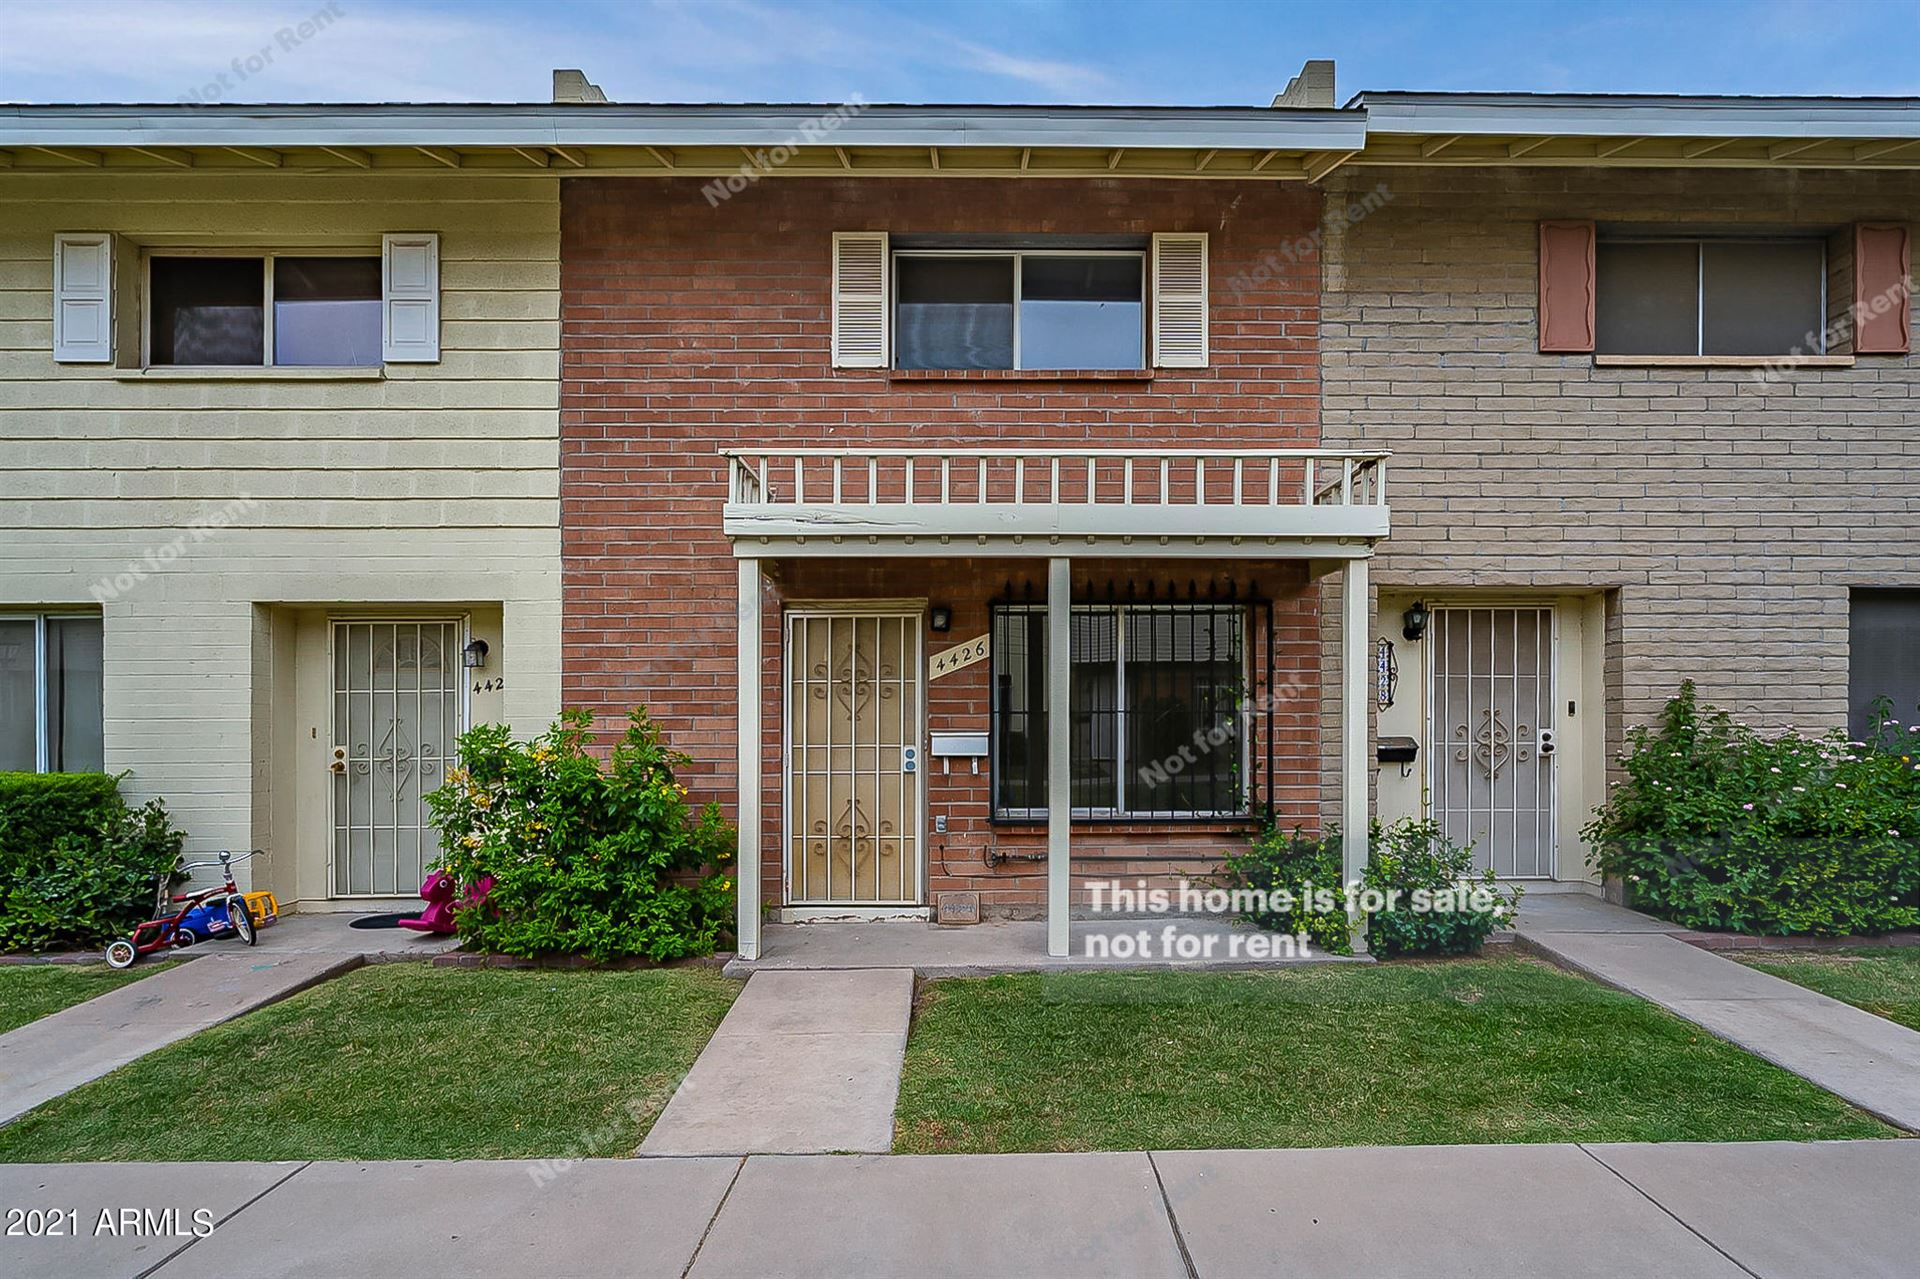 4426 E BELLEVIEW Street, Phoenix, AZ 85008 - MLS#: 6254644